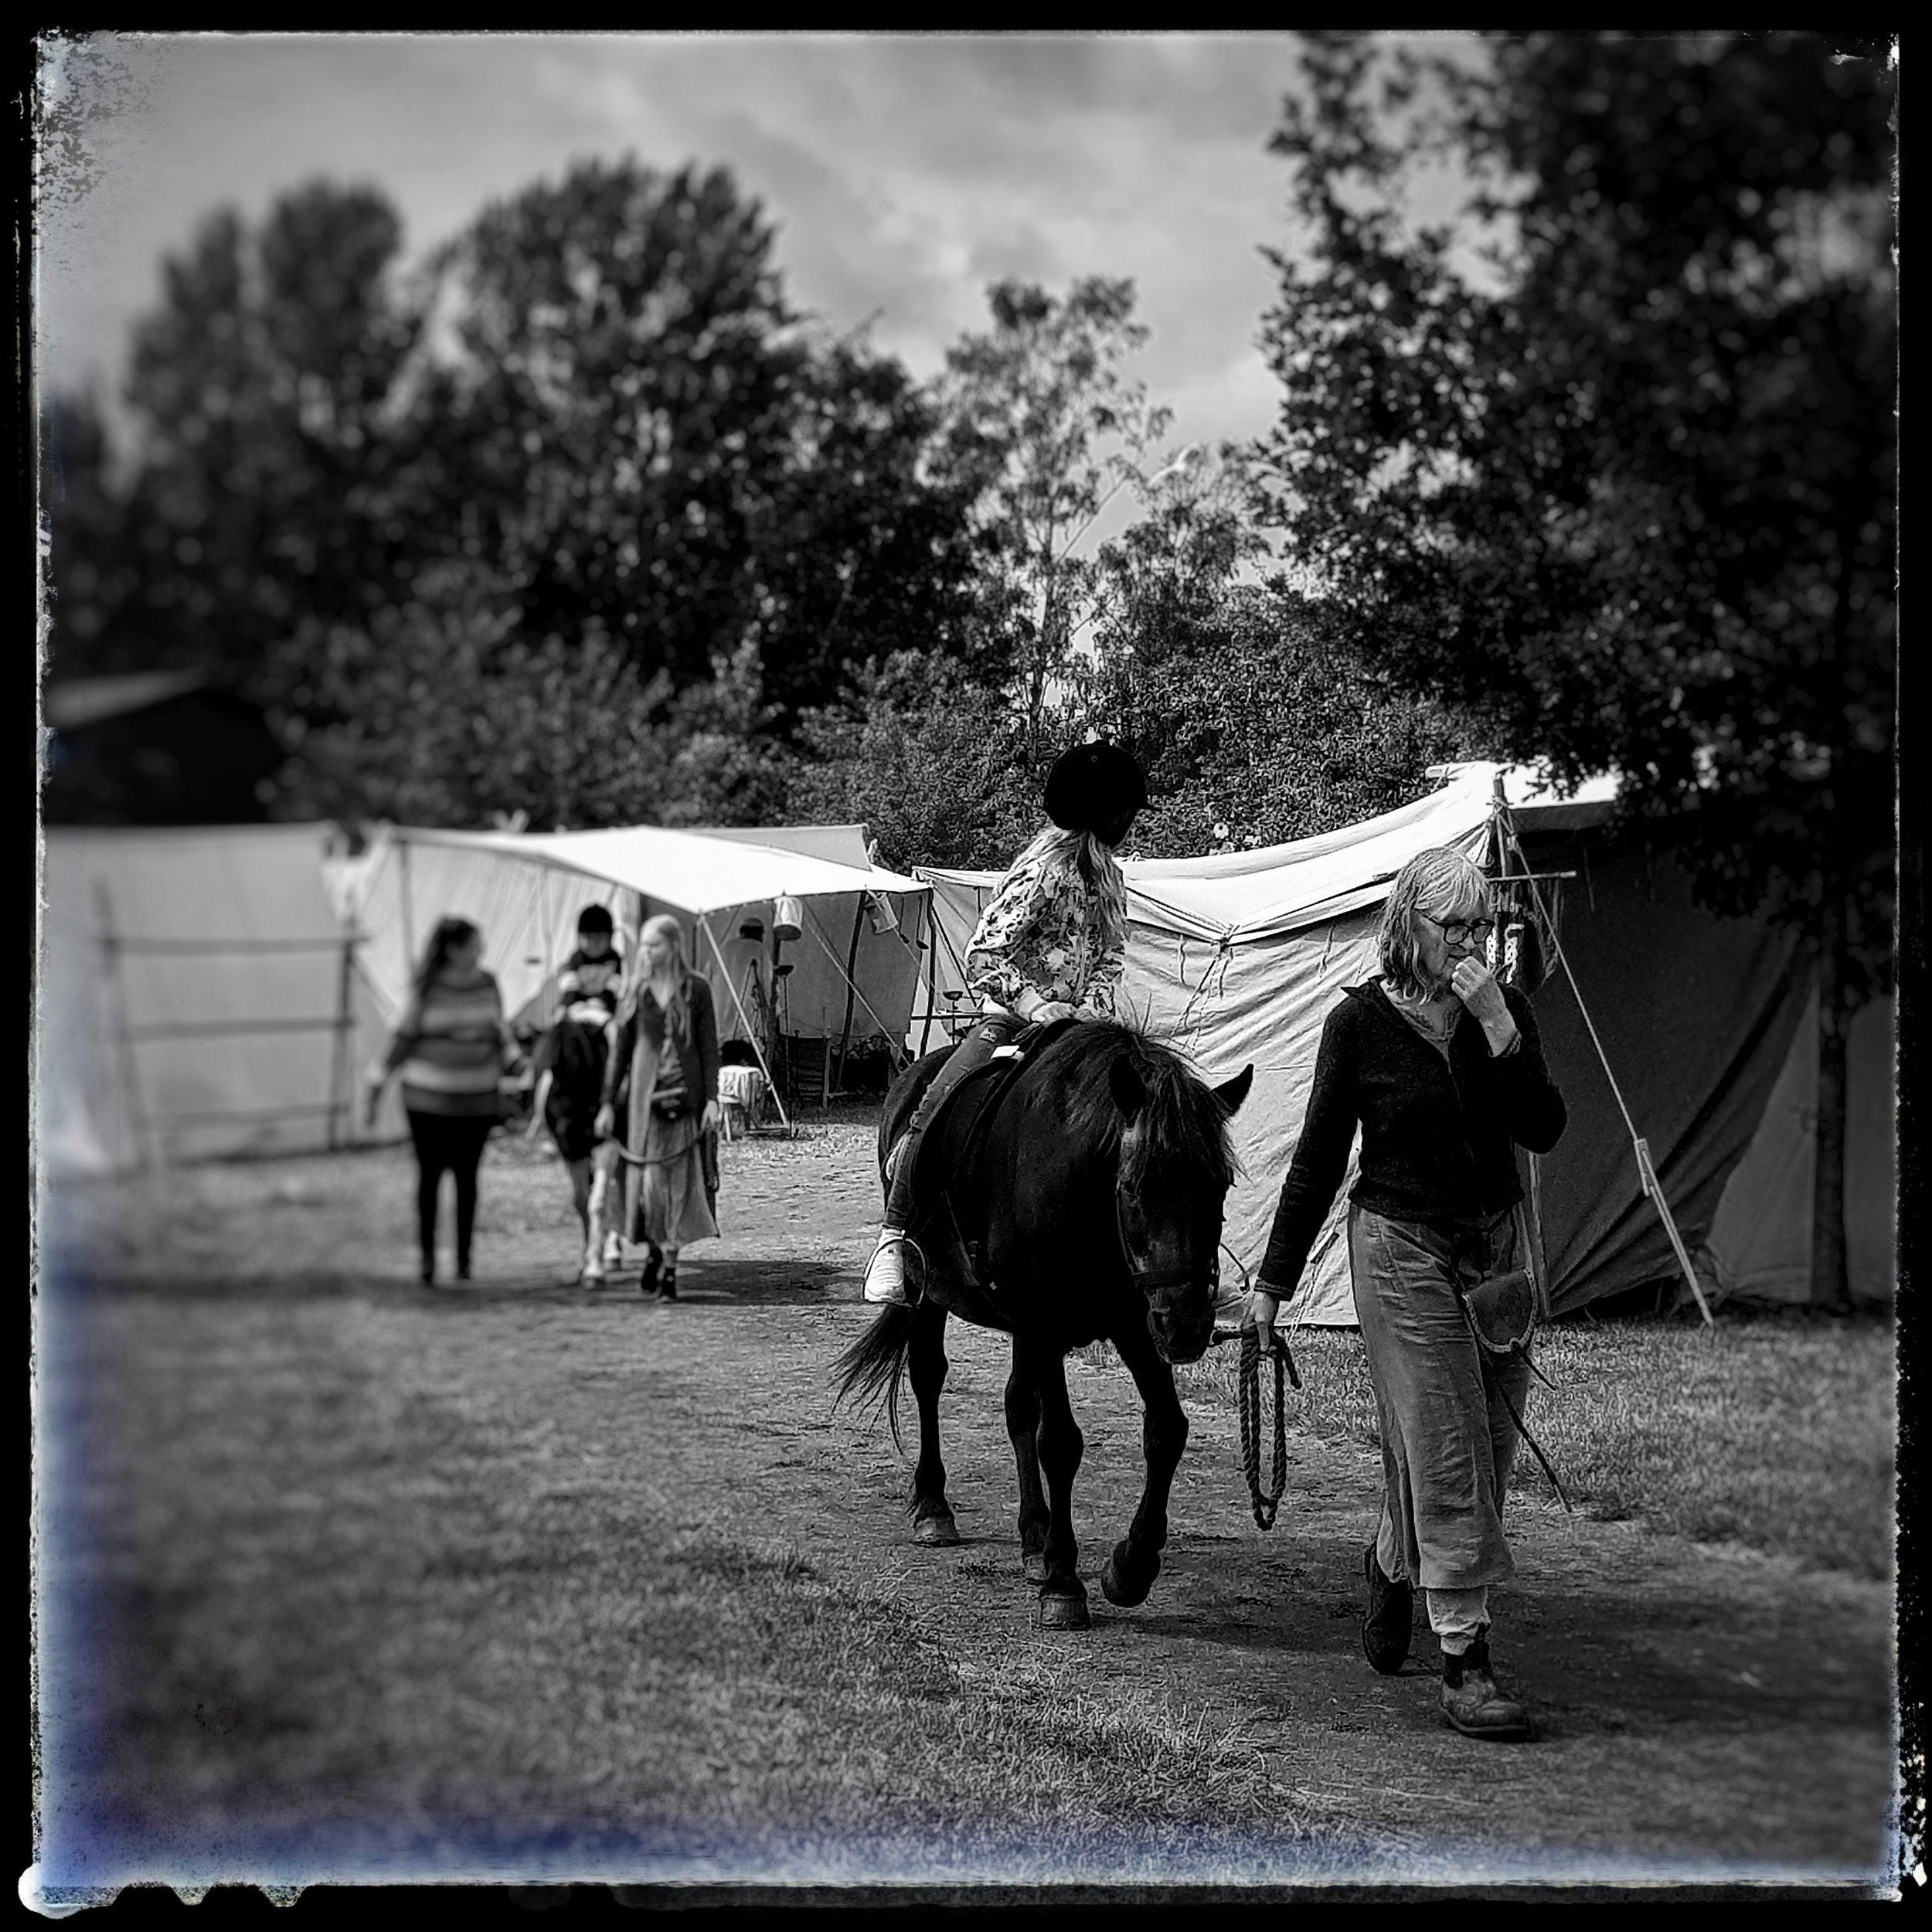 Day 188 - July 7: Horse ride at the Viking market